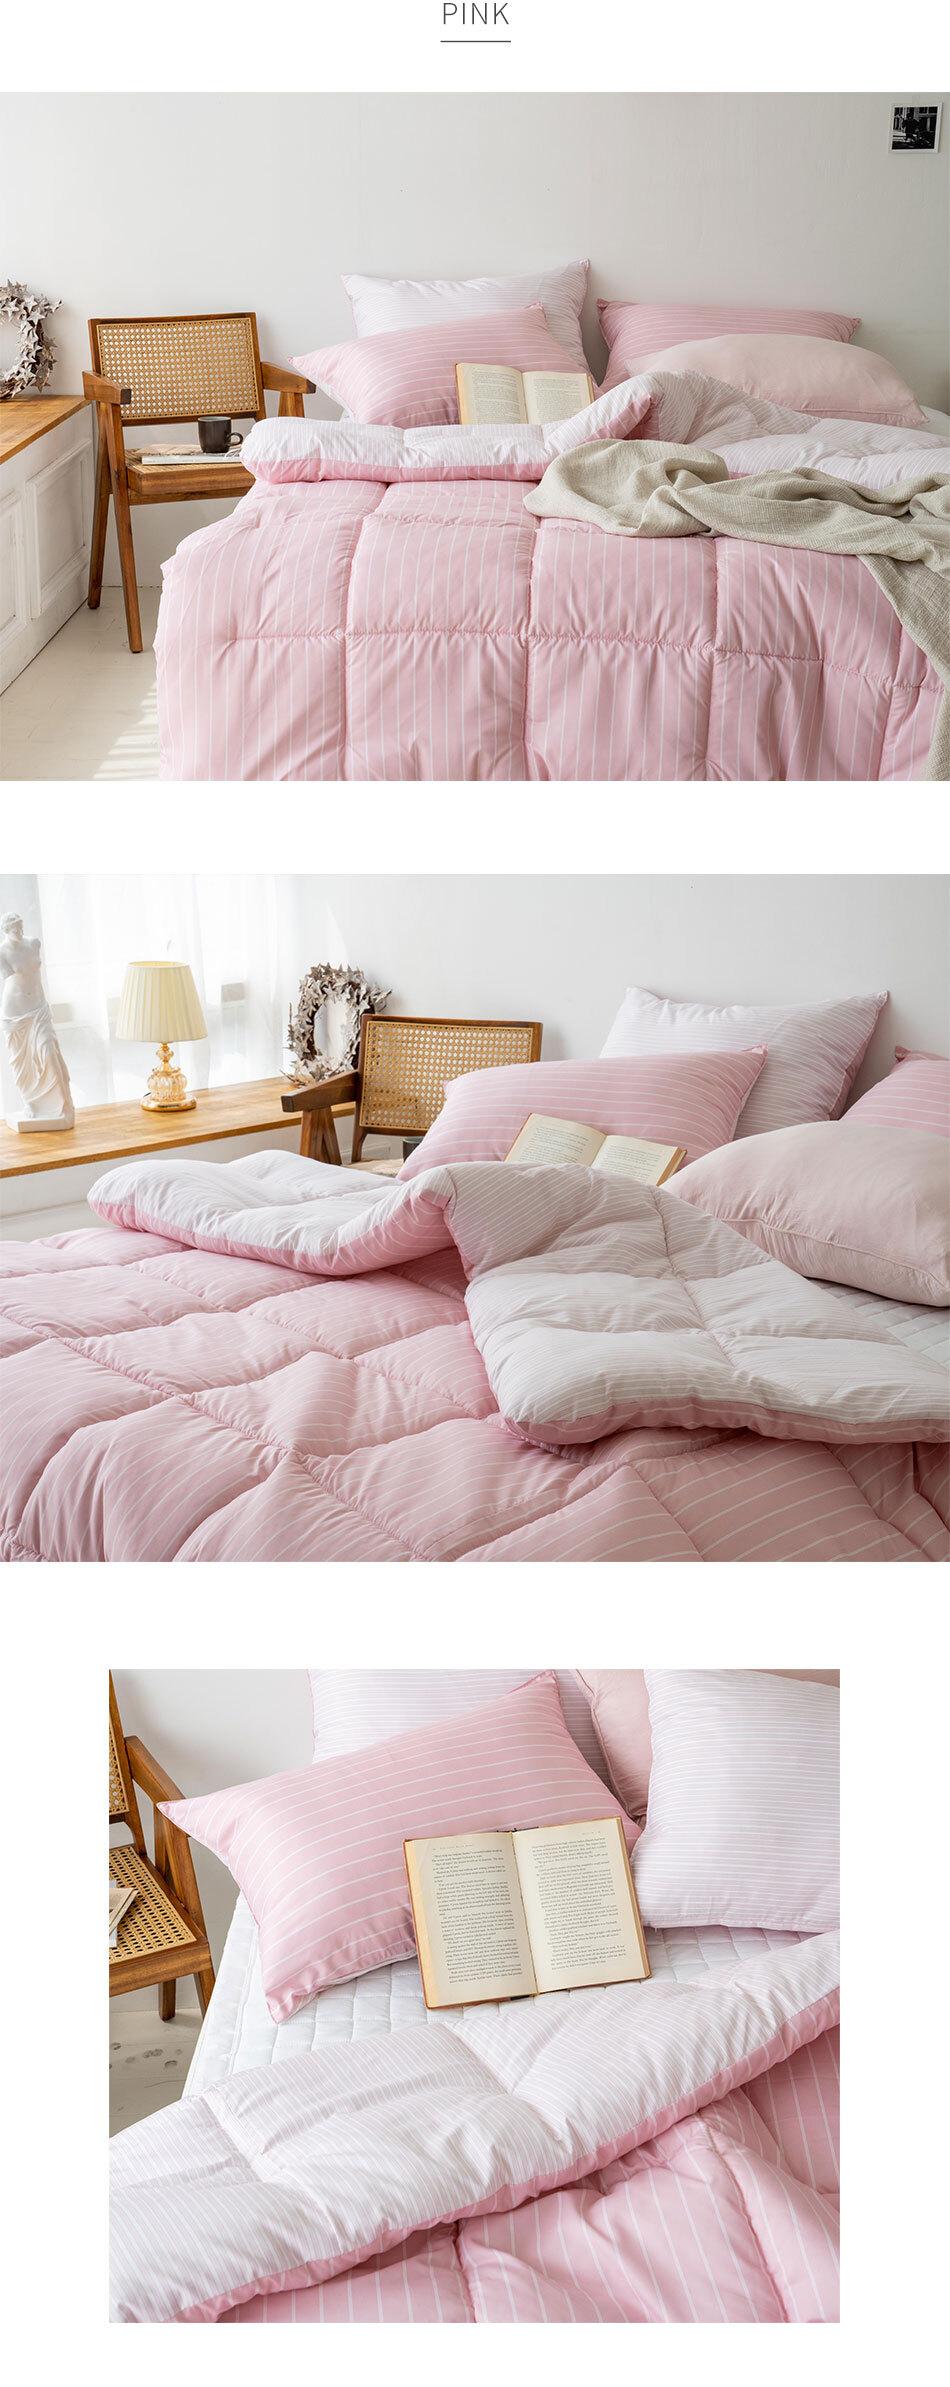 urban_bed_pink_01.jpg